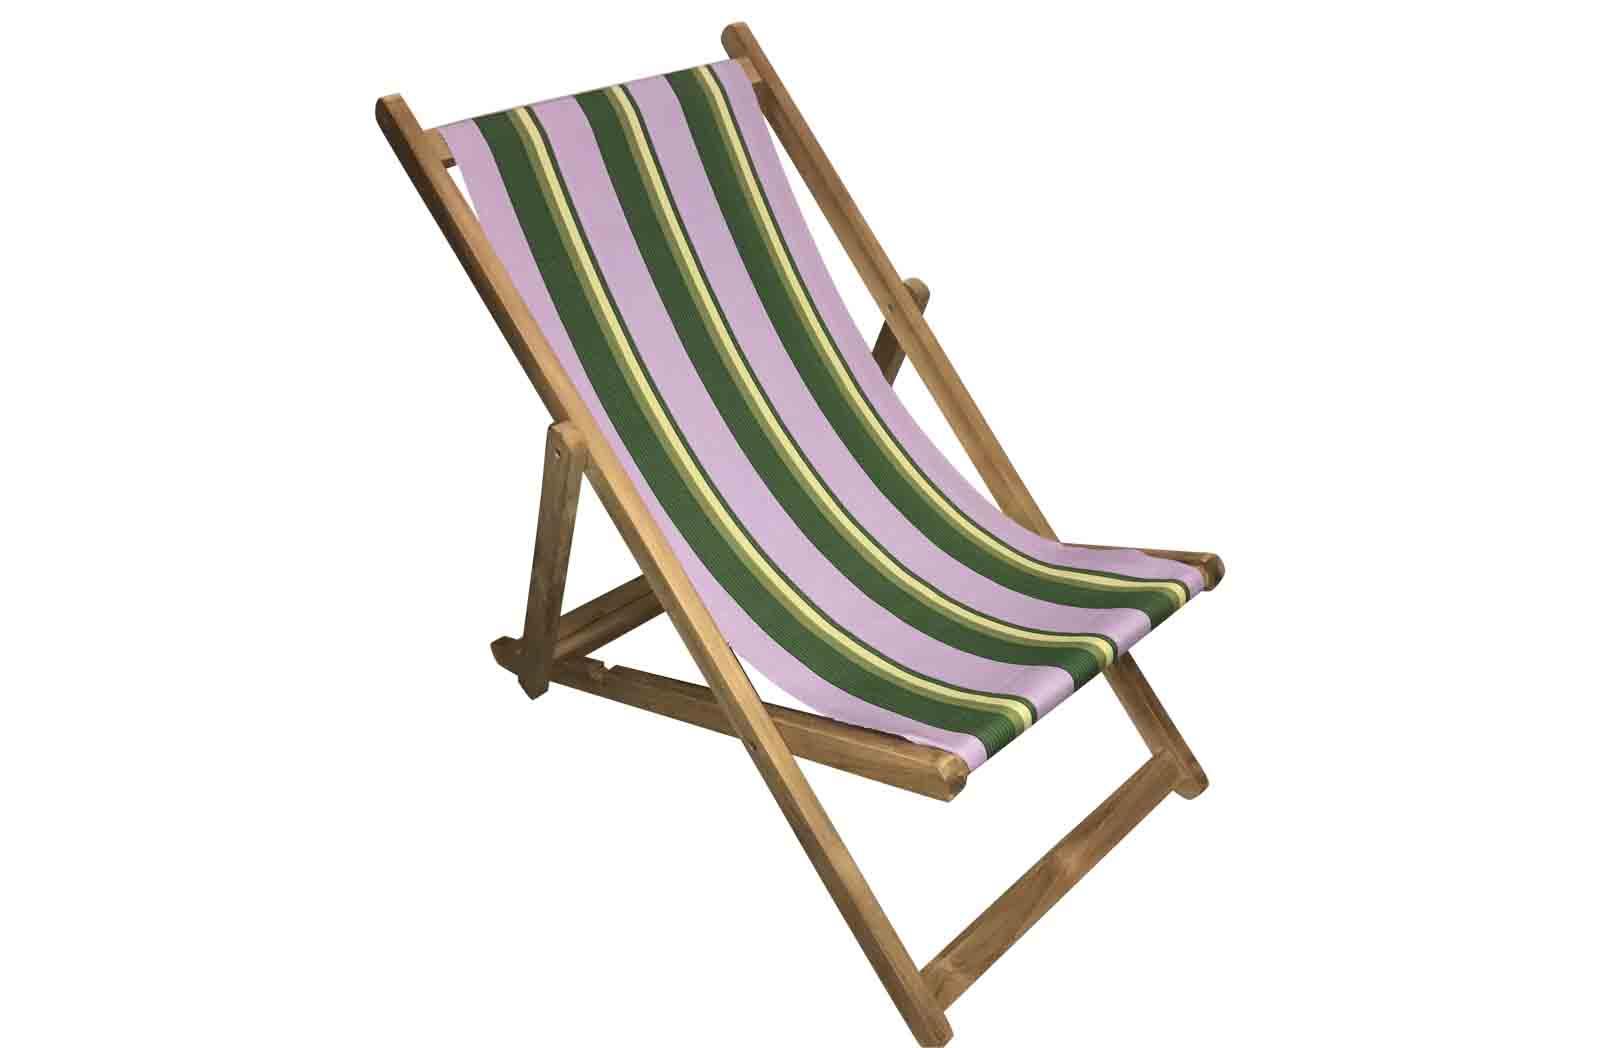 portable directors chair teen desk lilac deckchair canvas   fabrics striped deck hip hop stripes the ...